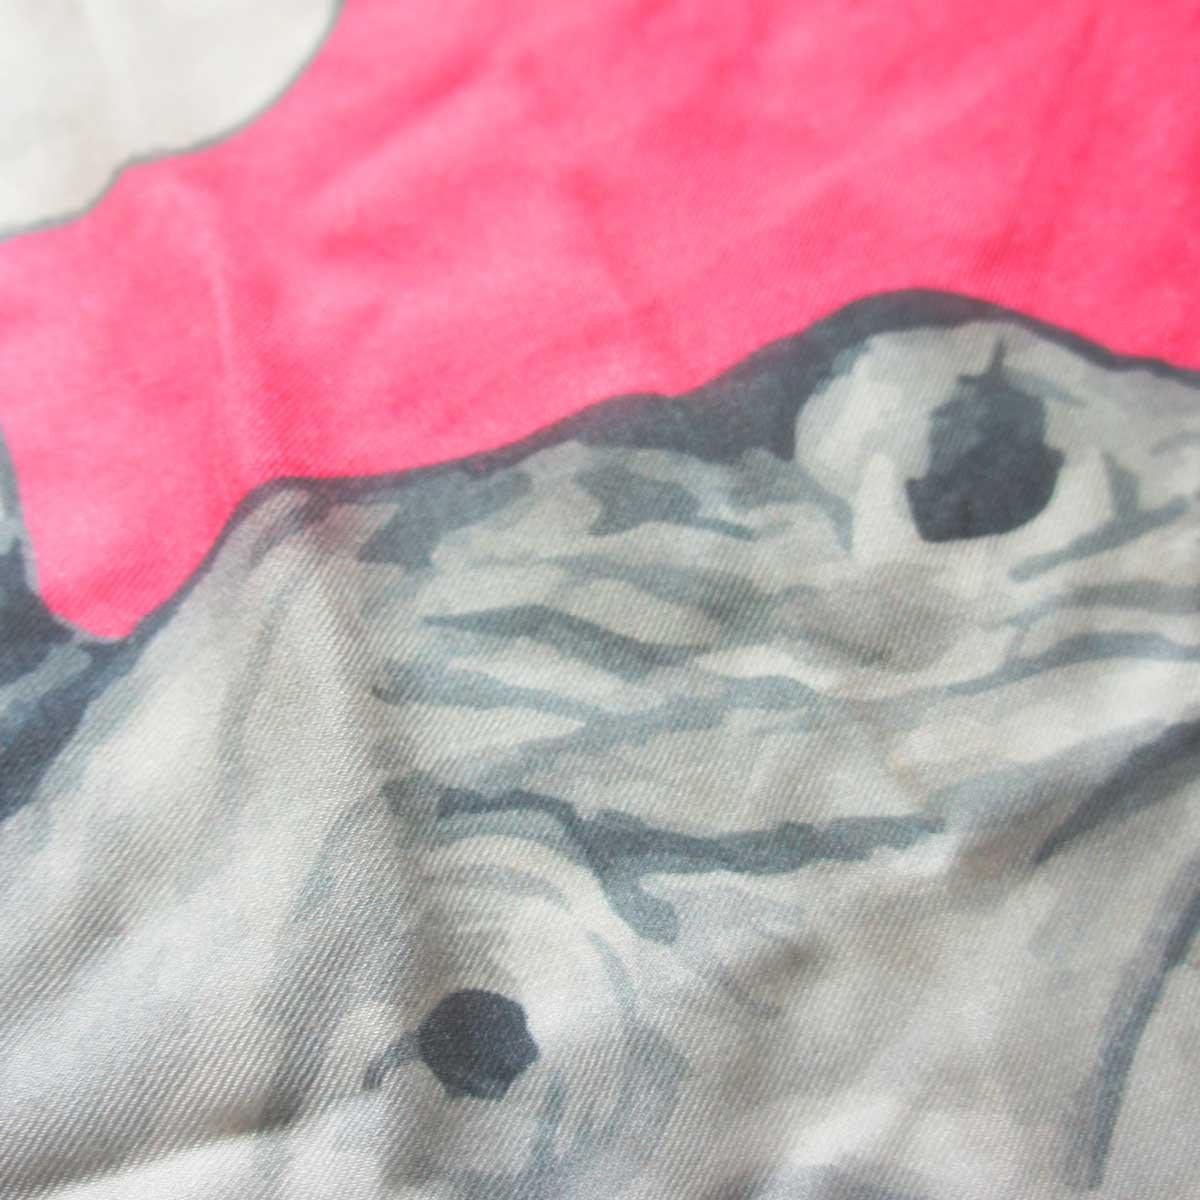 rhino-manifisto-scarf-philippsidler